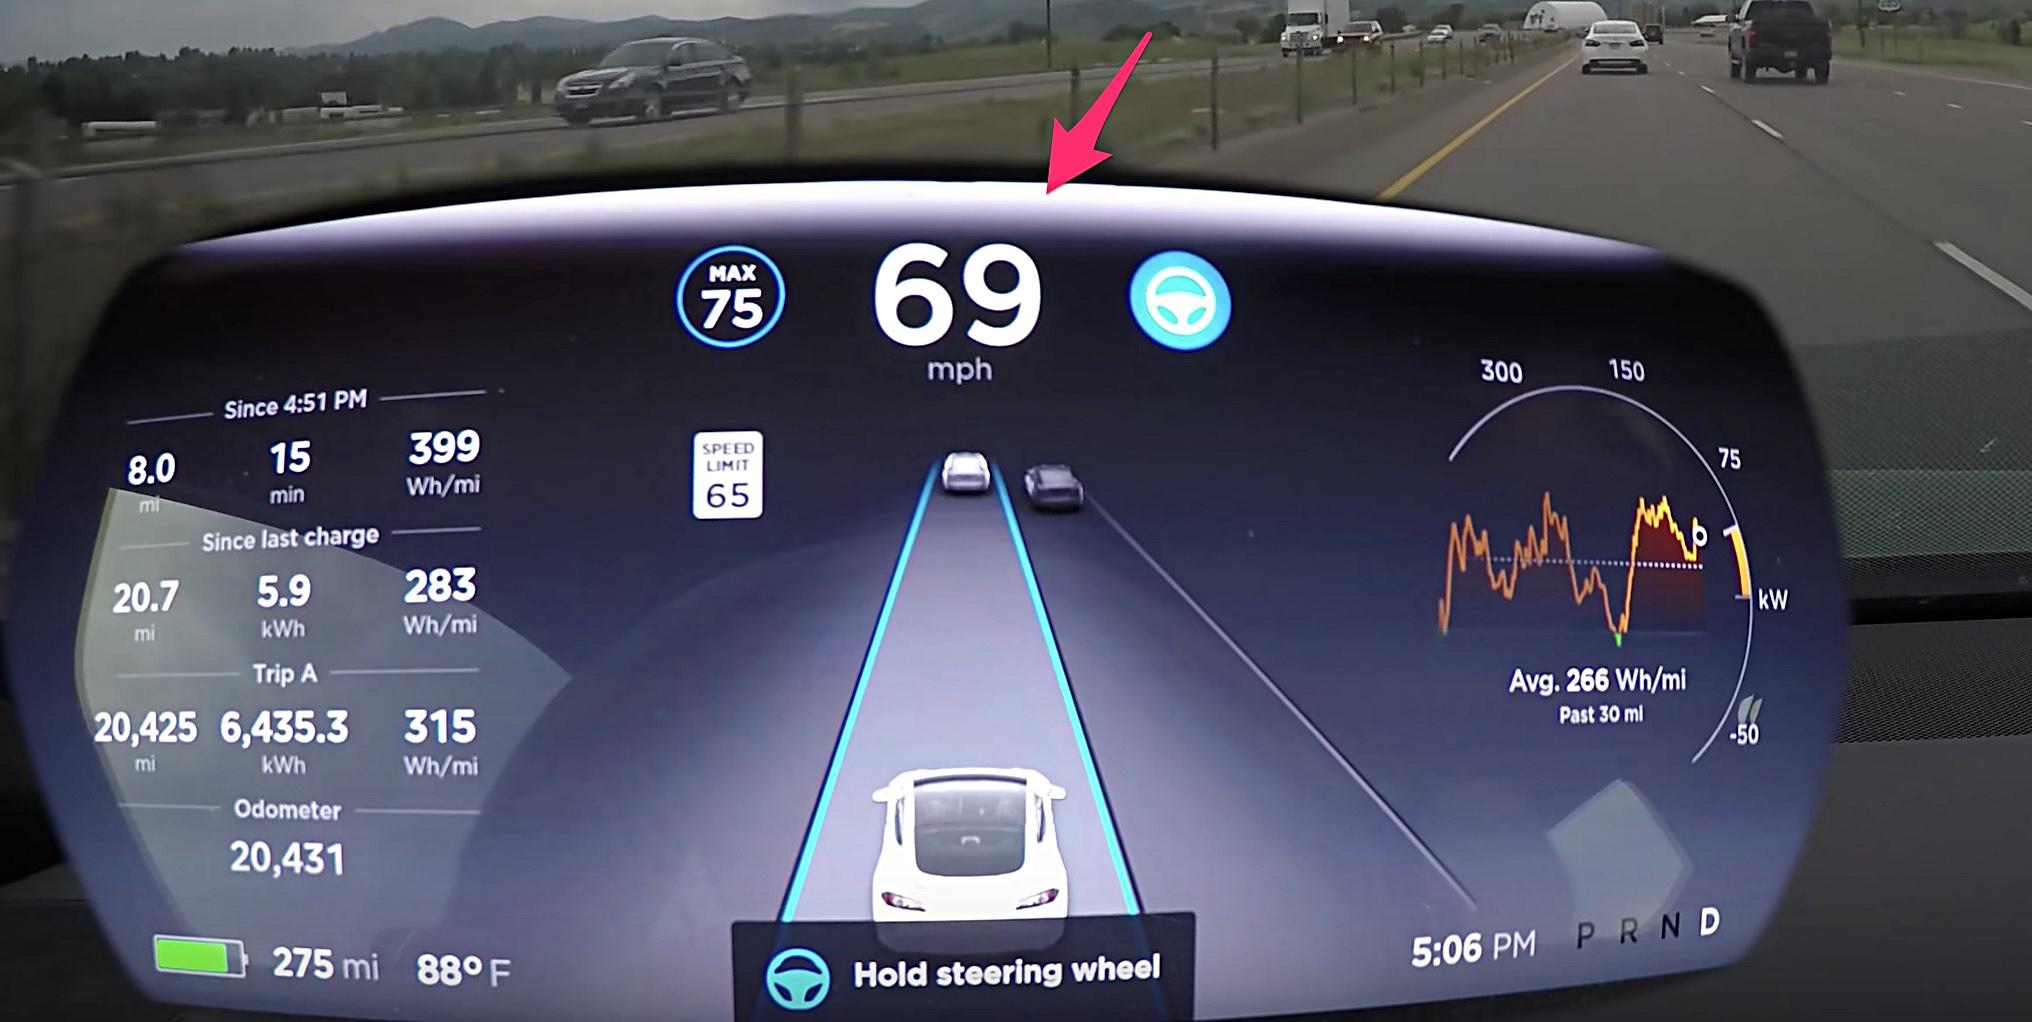 autopilot-hold-steering-wheel-alert-nag